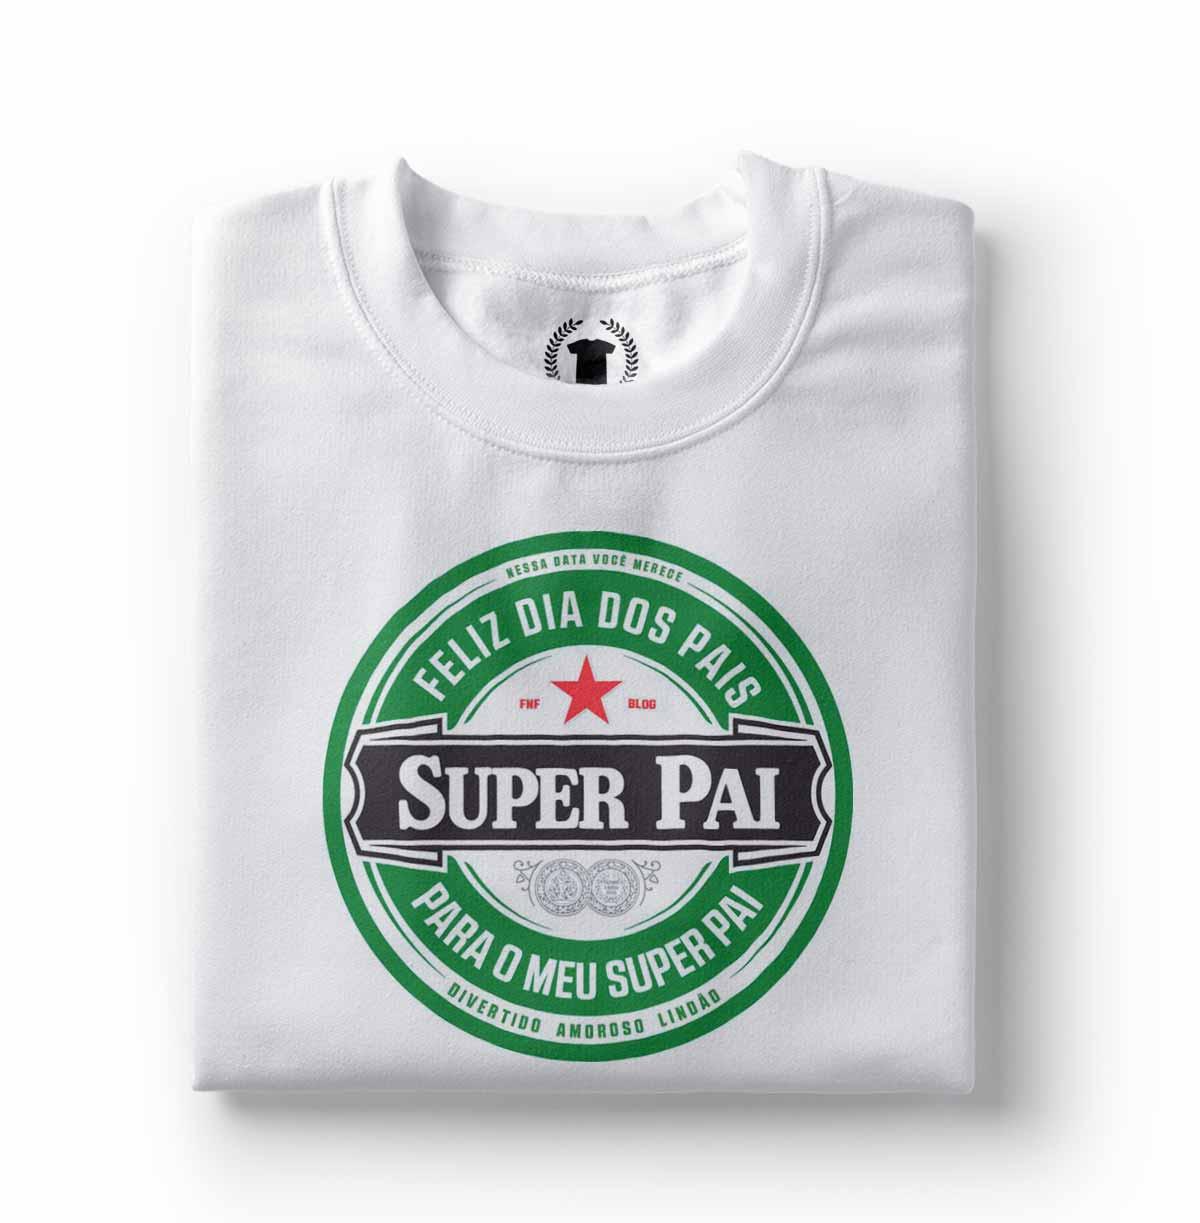 camiseta feliz dia dos pais super pai